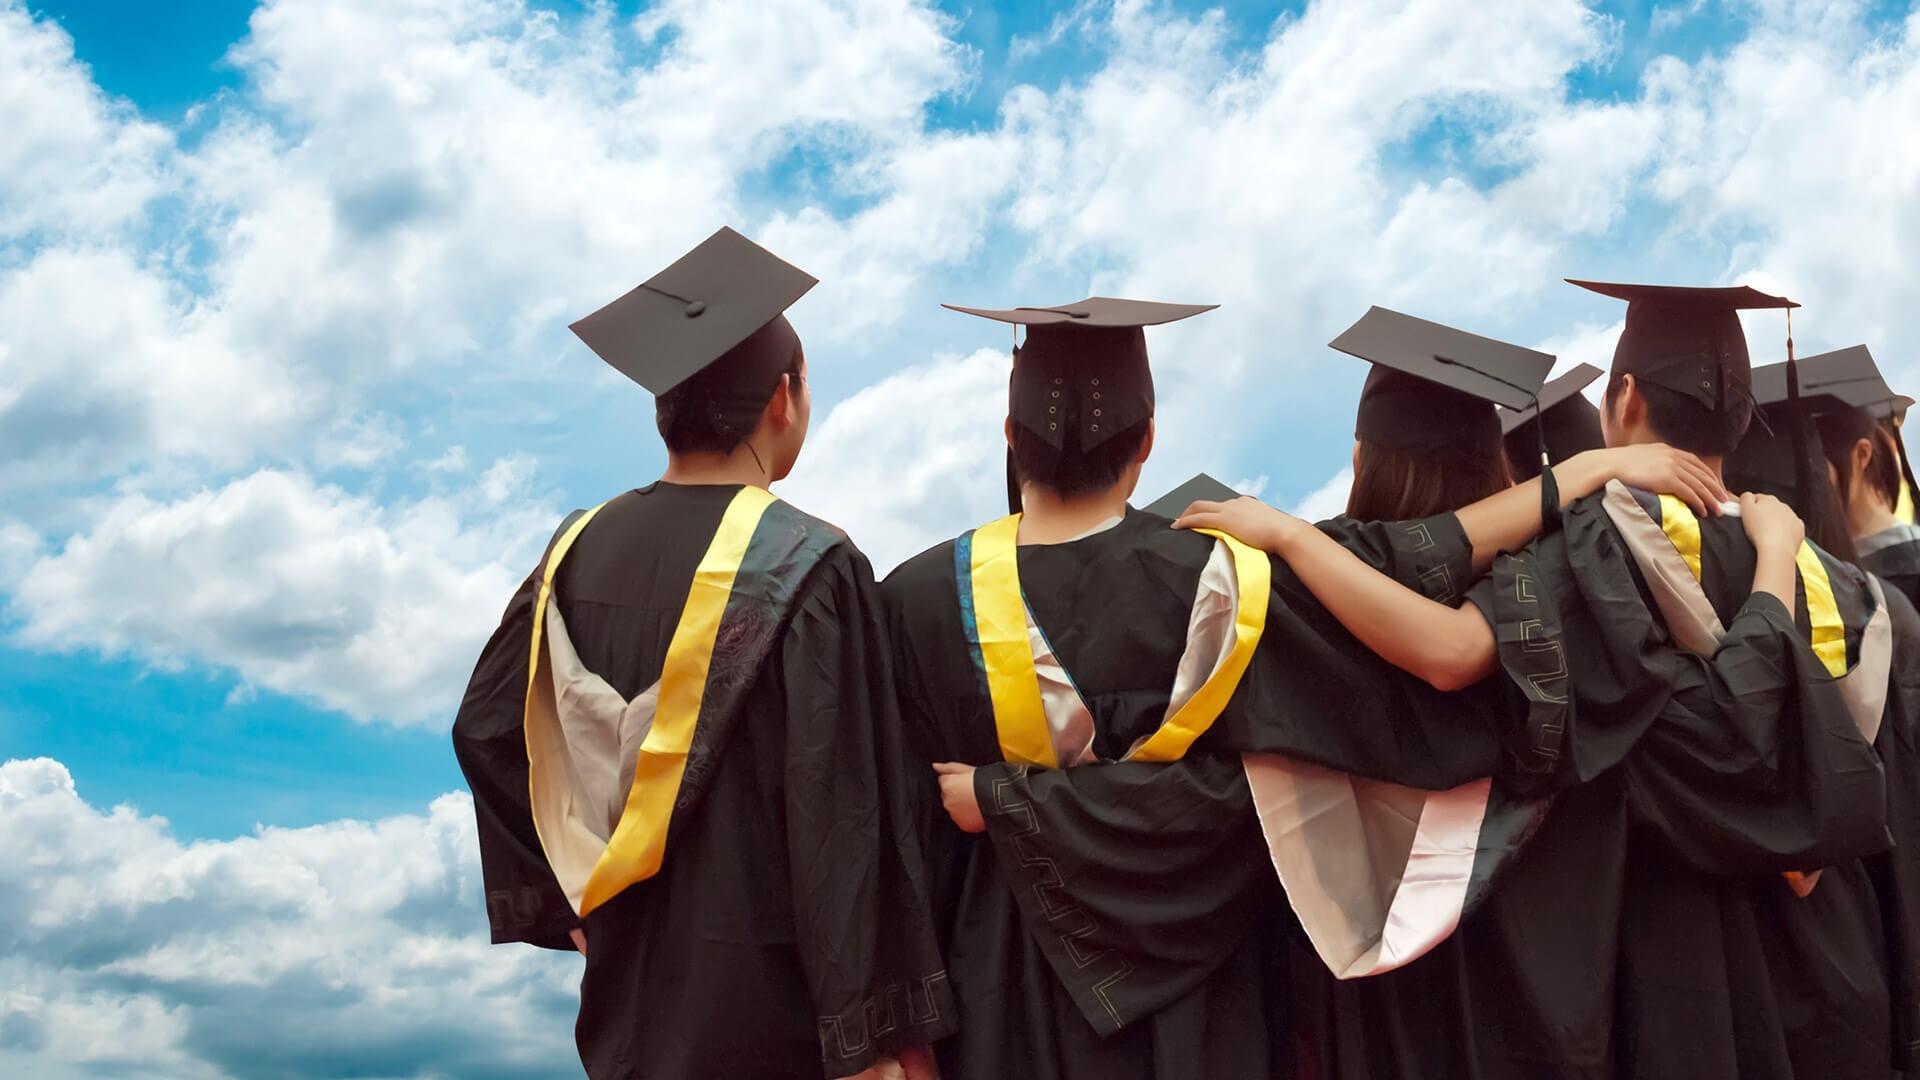 Graduation Desktop wallpaper